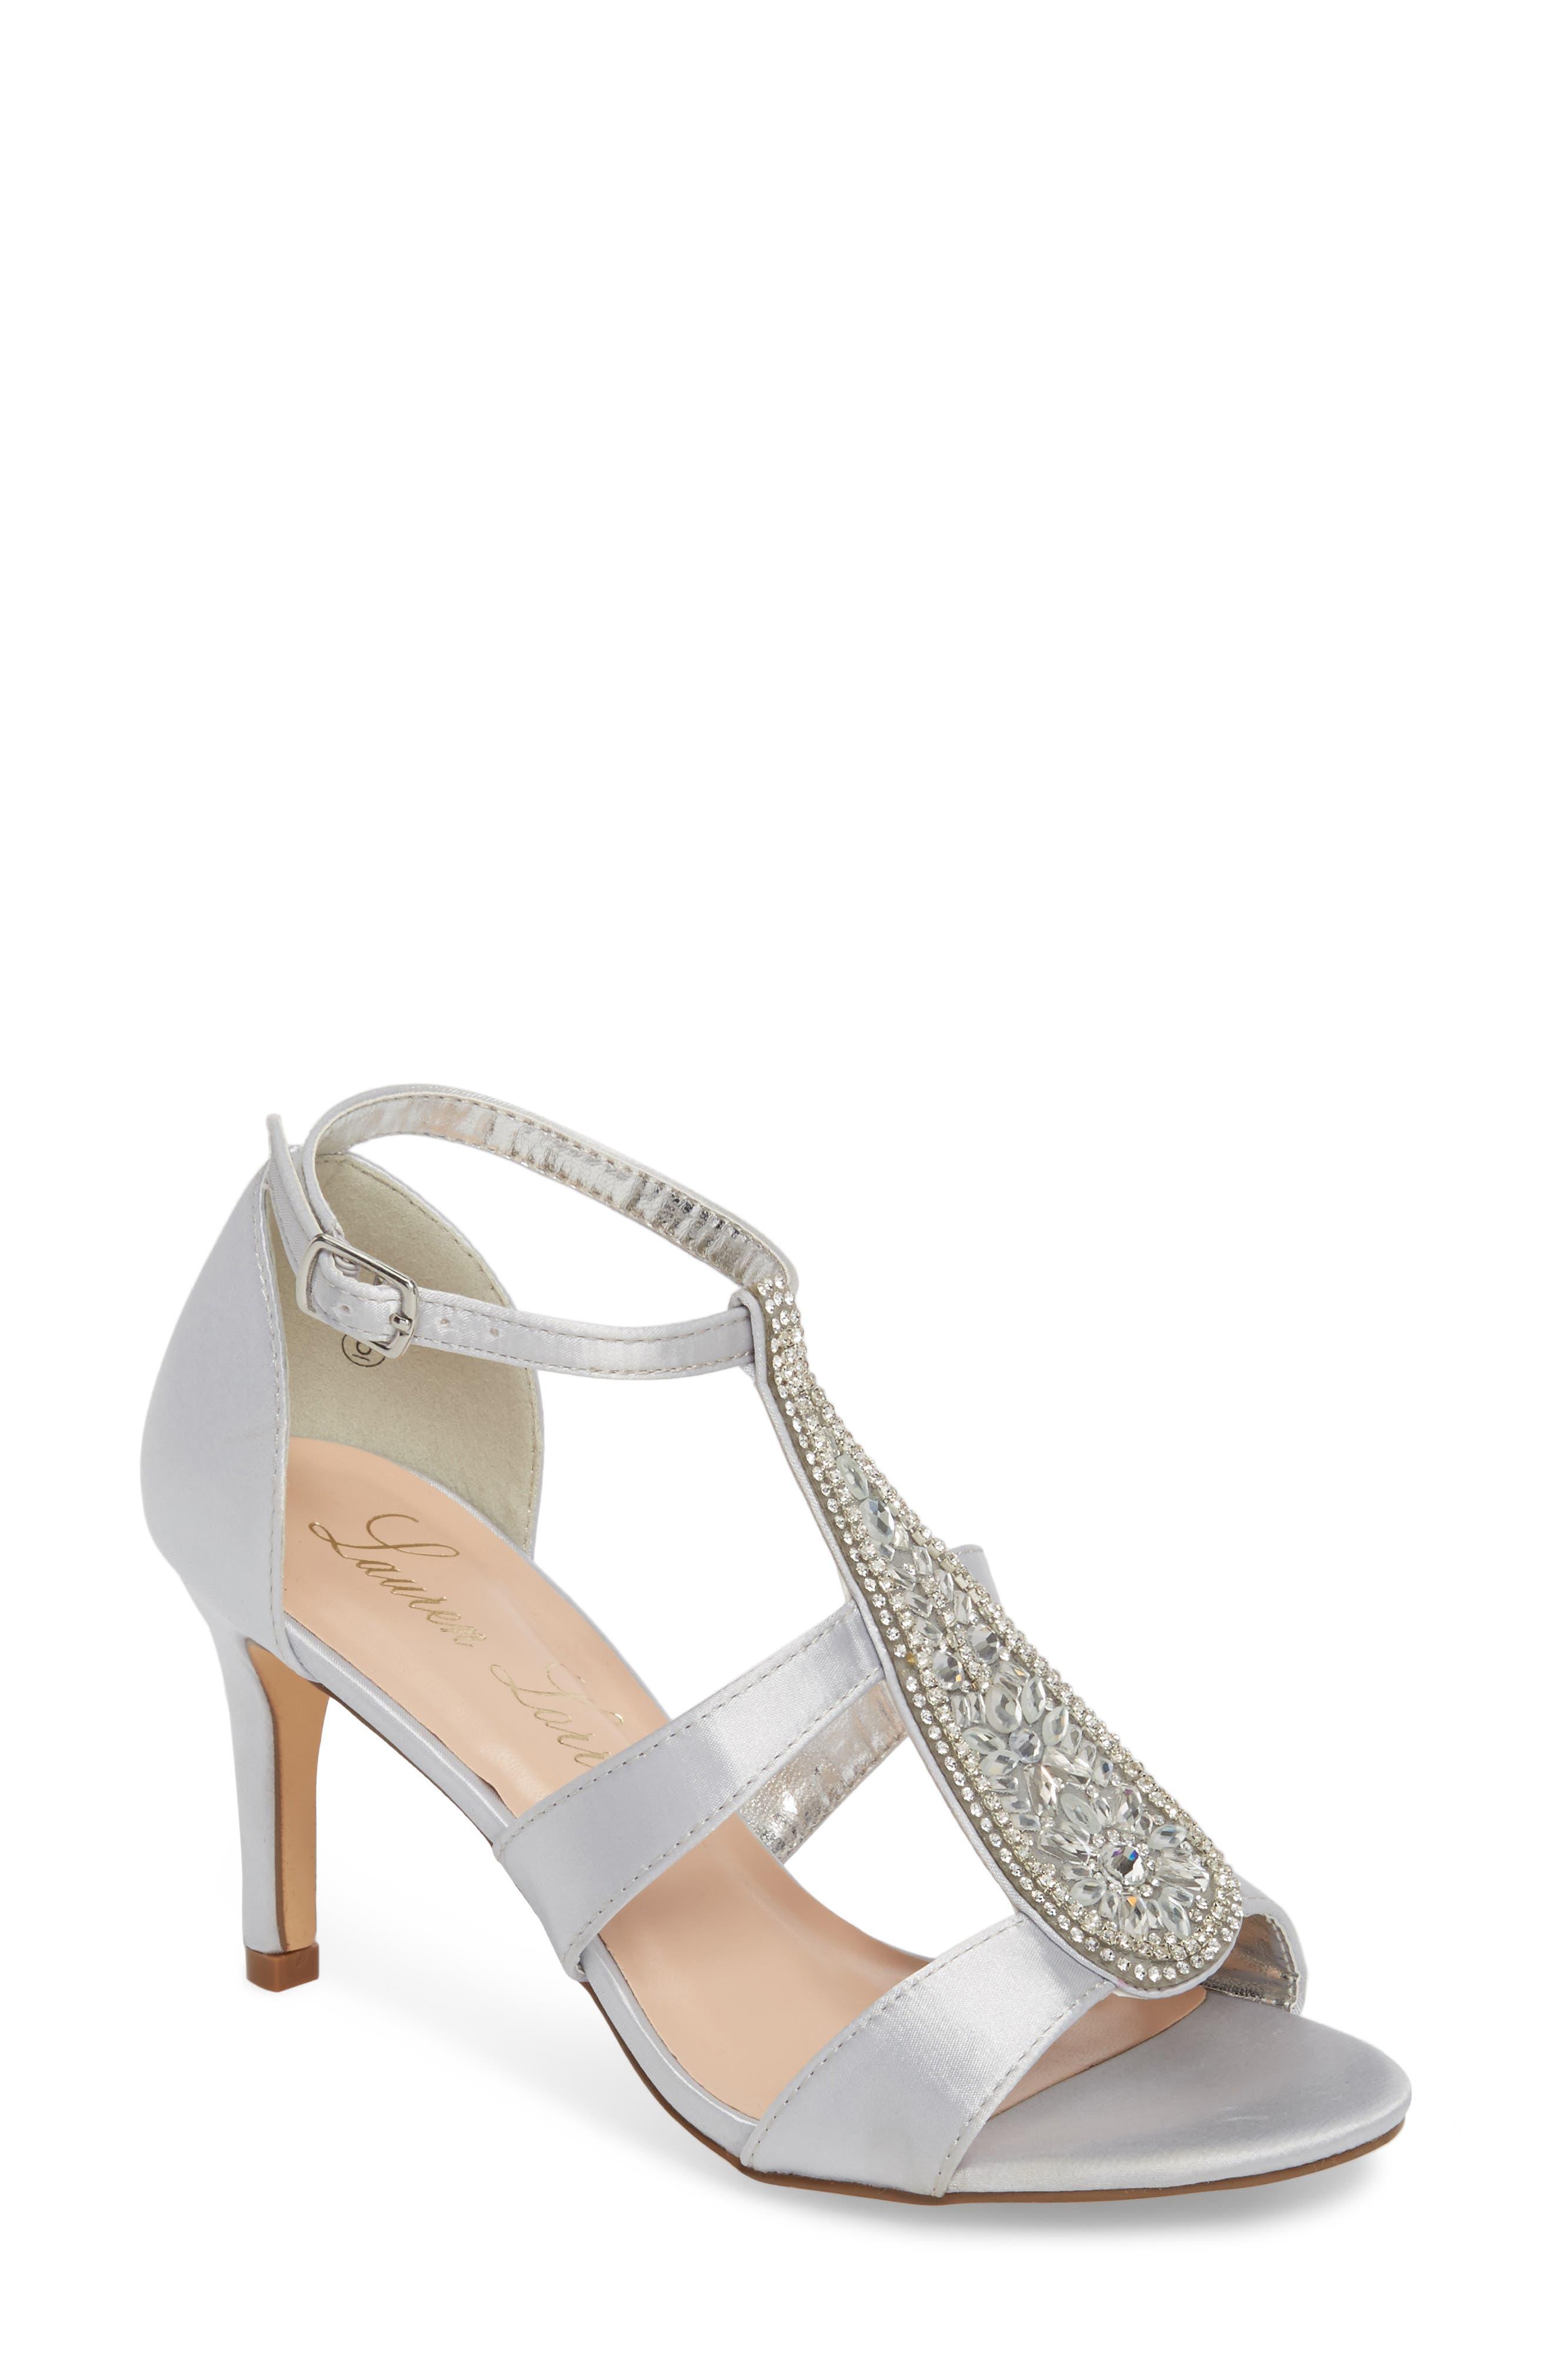 Lauren Lorraine Ritz Crystal Embellished Sandal- Metallic